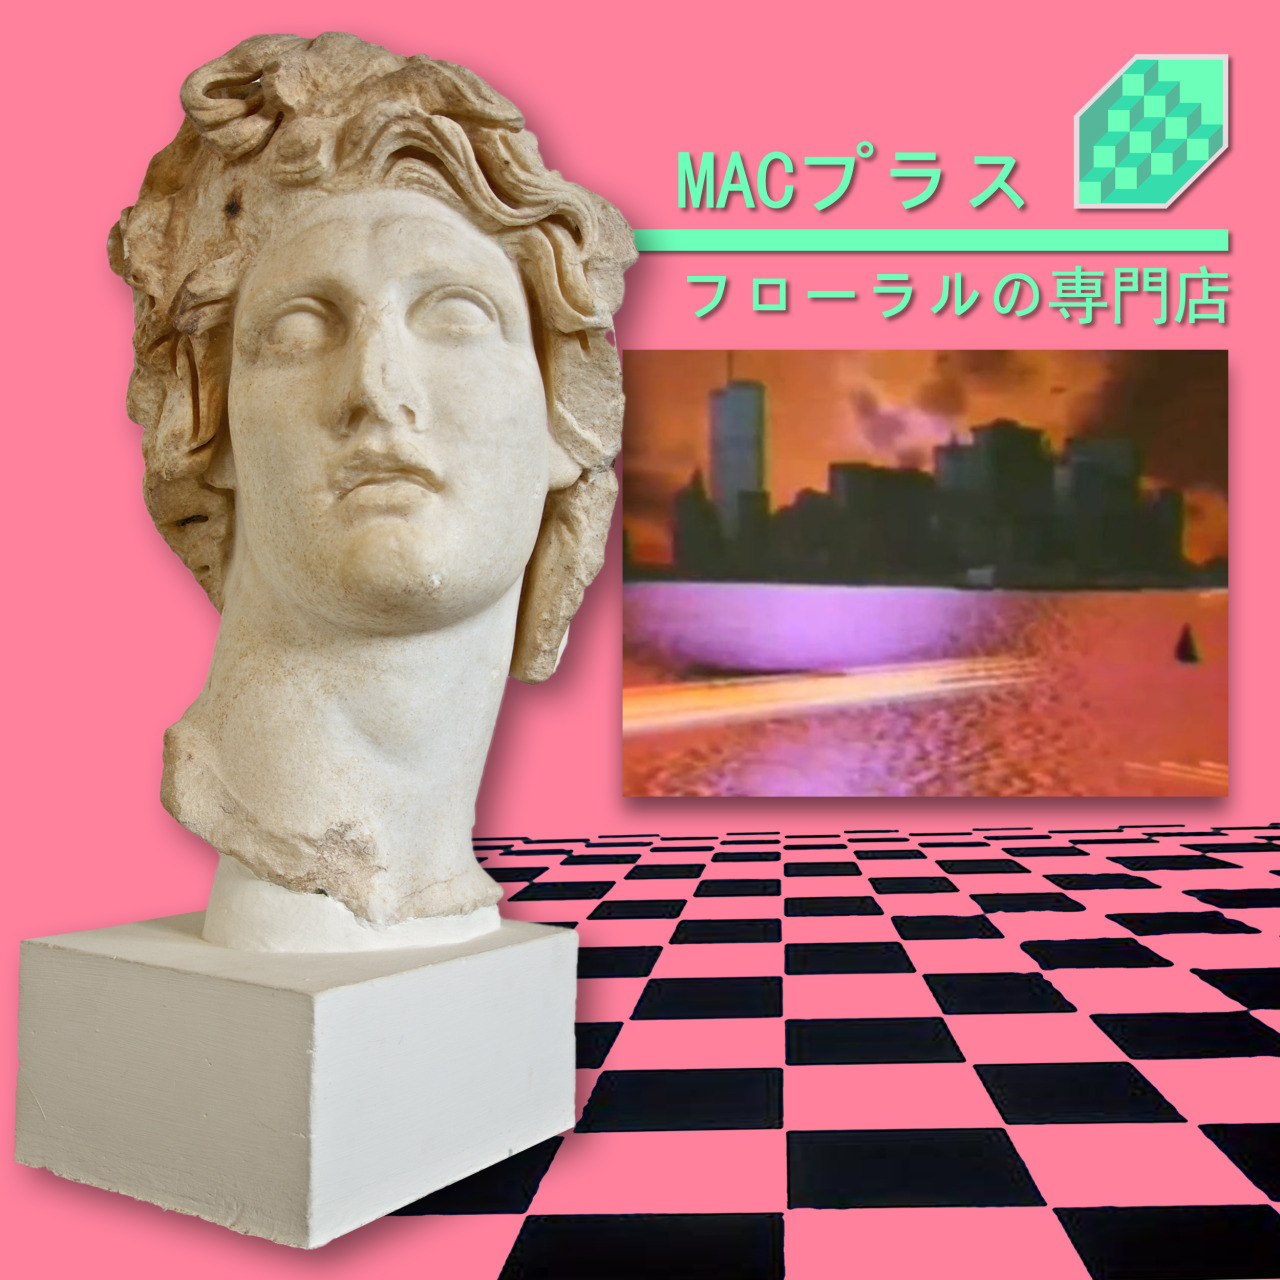 loral Shoppe by Macintosh Plus (aka Vektroid) | Vaporwave A e s t h e t i c | Girlfriend is Better